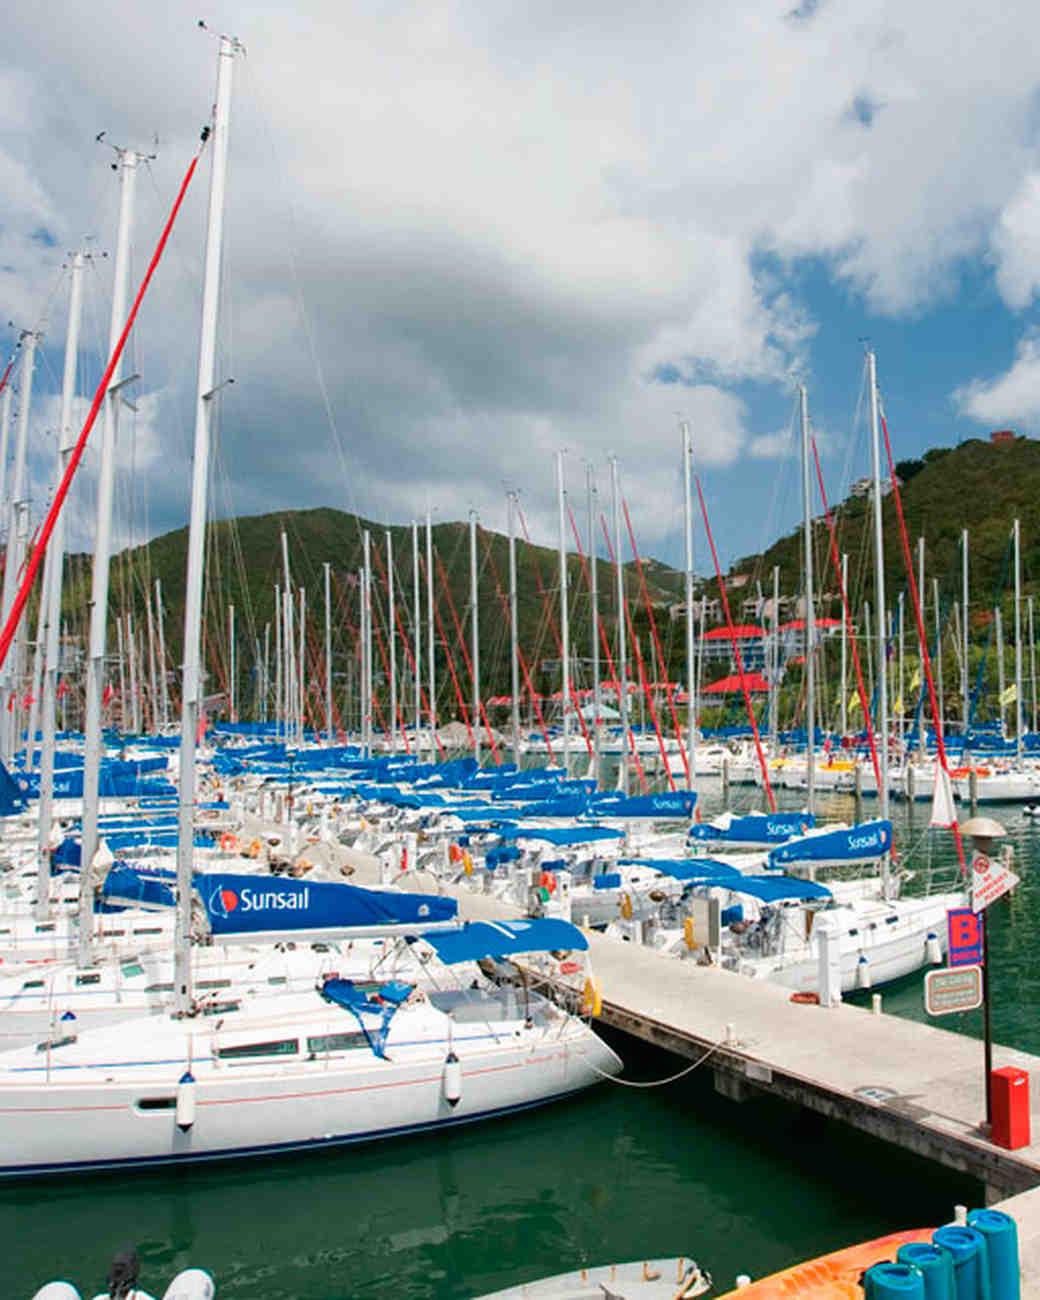 Sunsail Wickhams Cay Marina catamaran